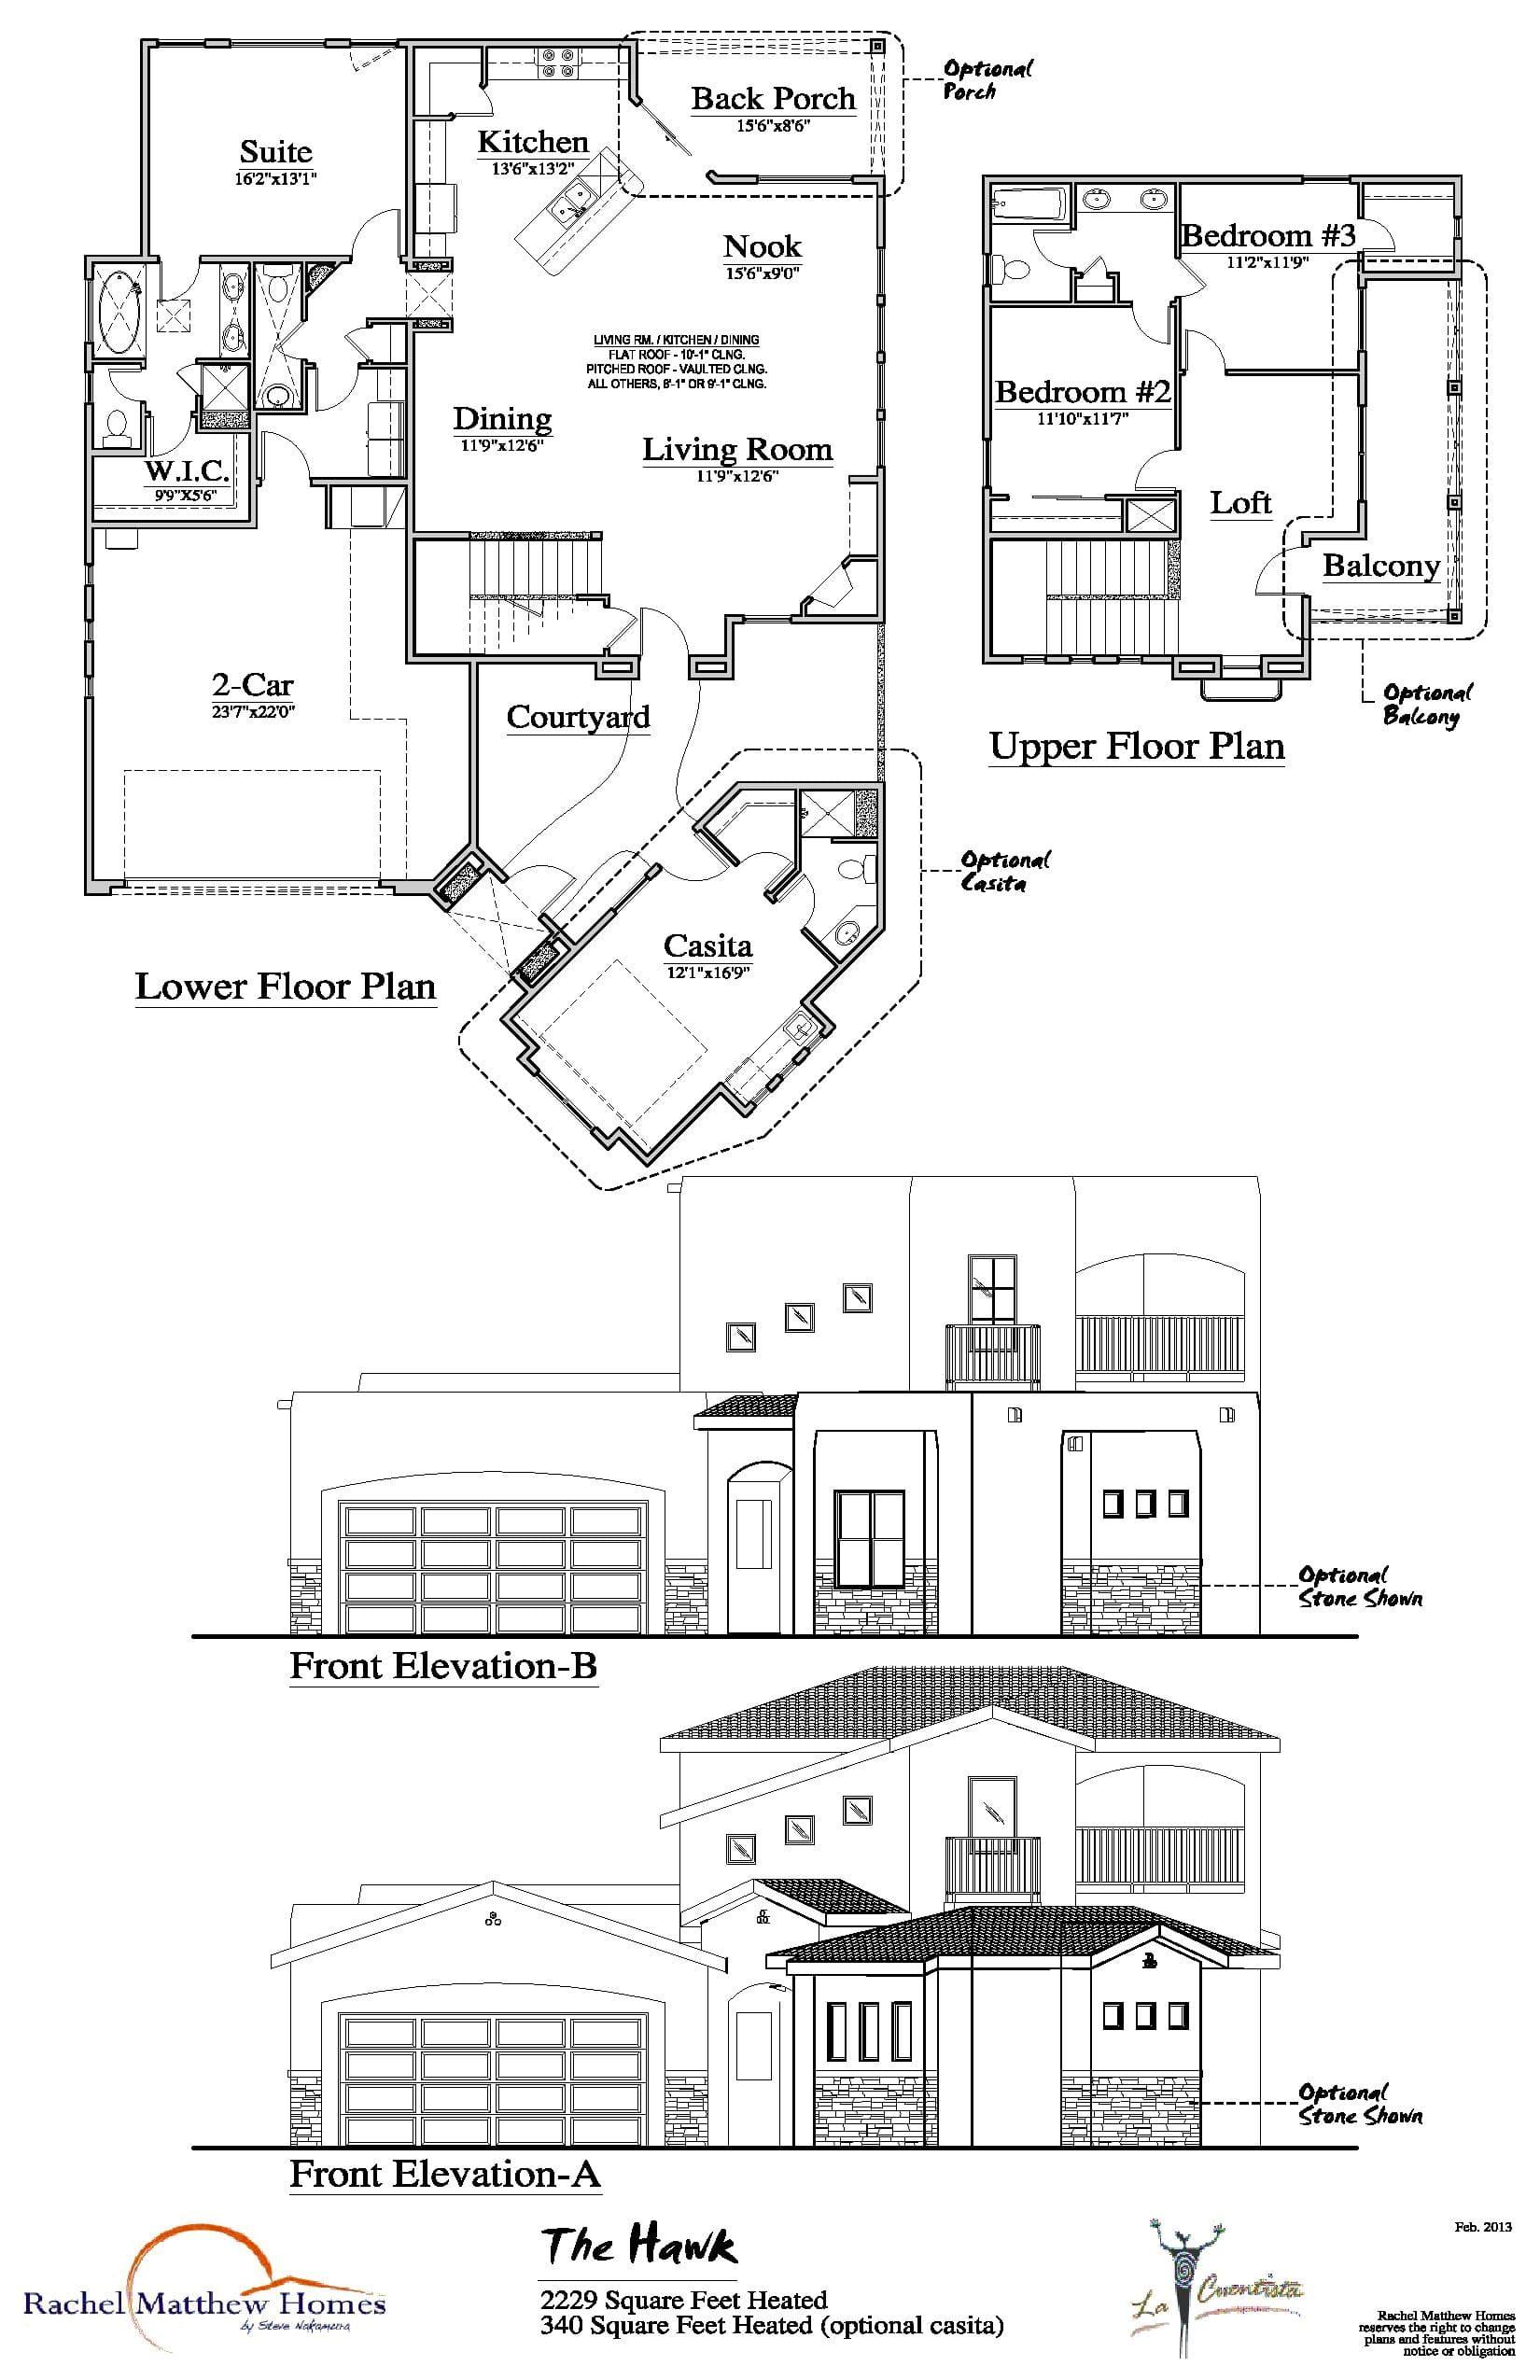 Rachel Matthew homes on elizabeth homes plans, ryan homes plans, victoria homes plans, jordan homes plans,